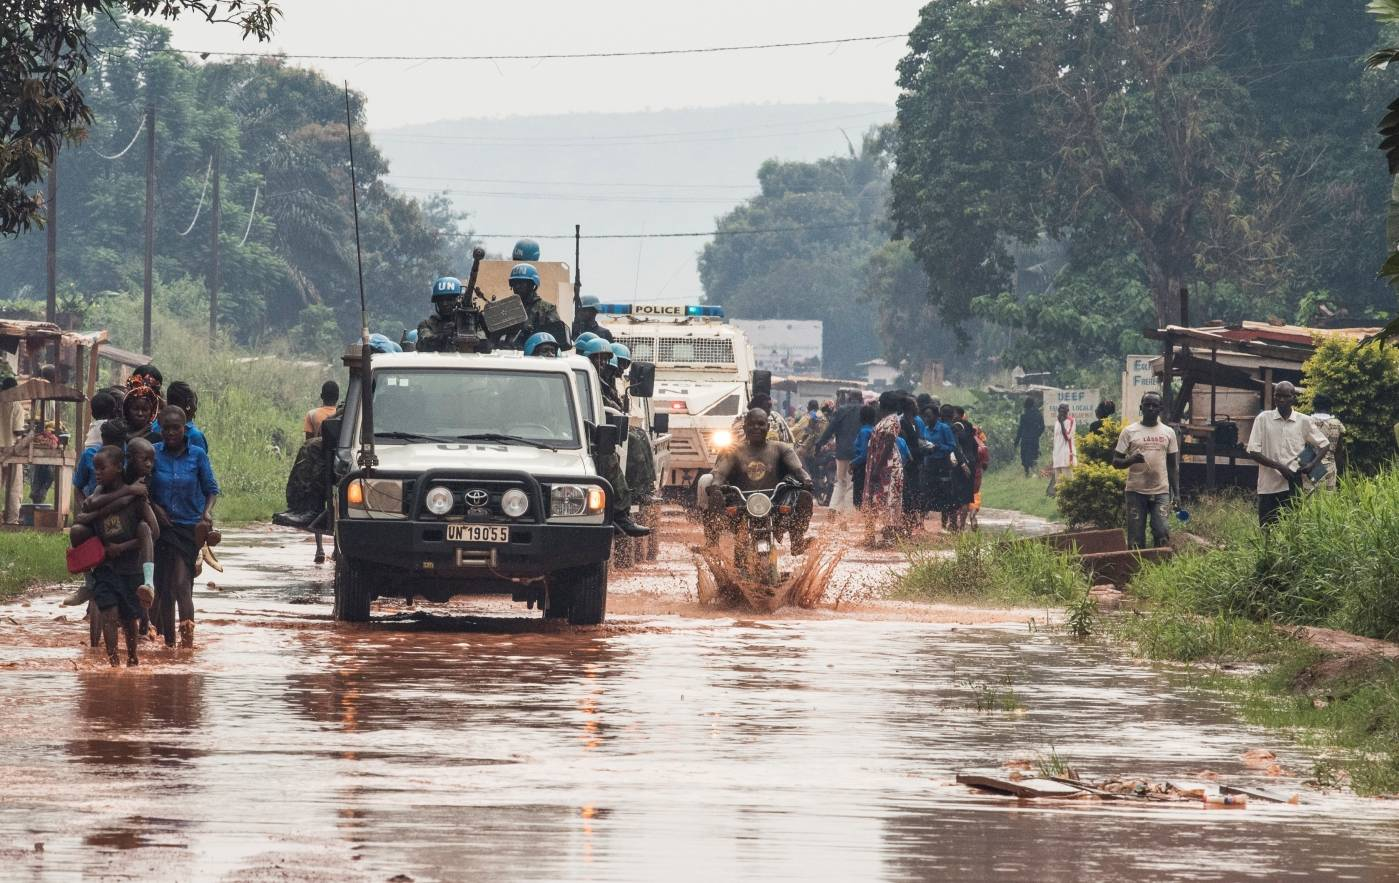 FN:s fredsbevarande styrkor patrullerar i Centralafrikanska republiken. Foto: UN Photo / Eskinder Debebe.